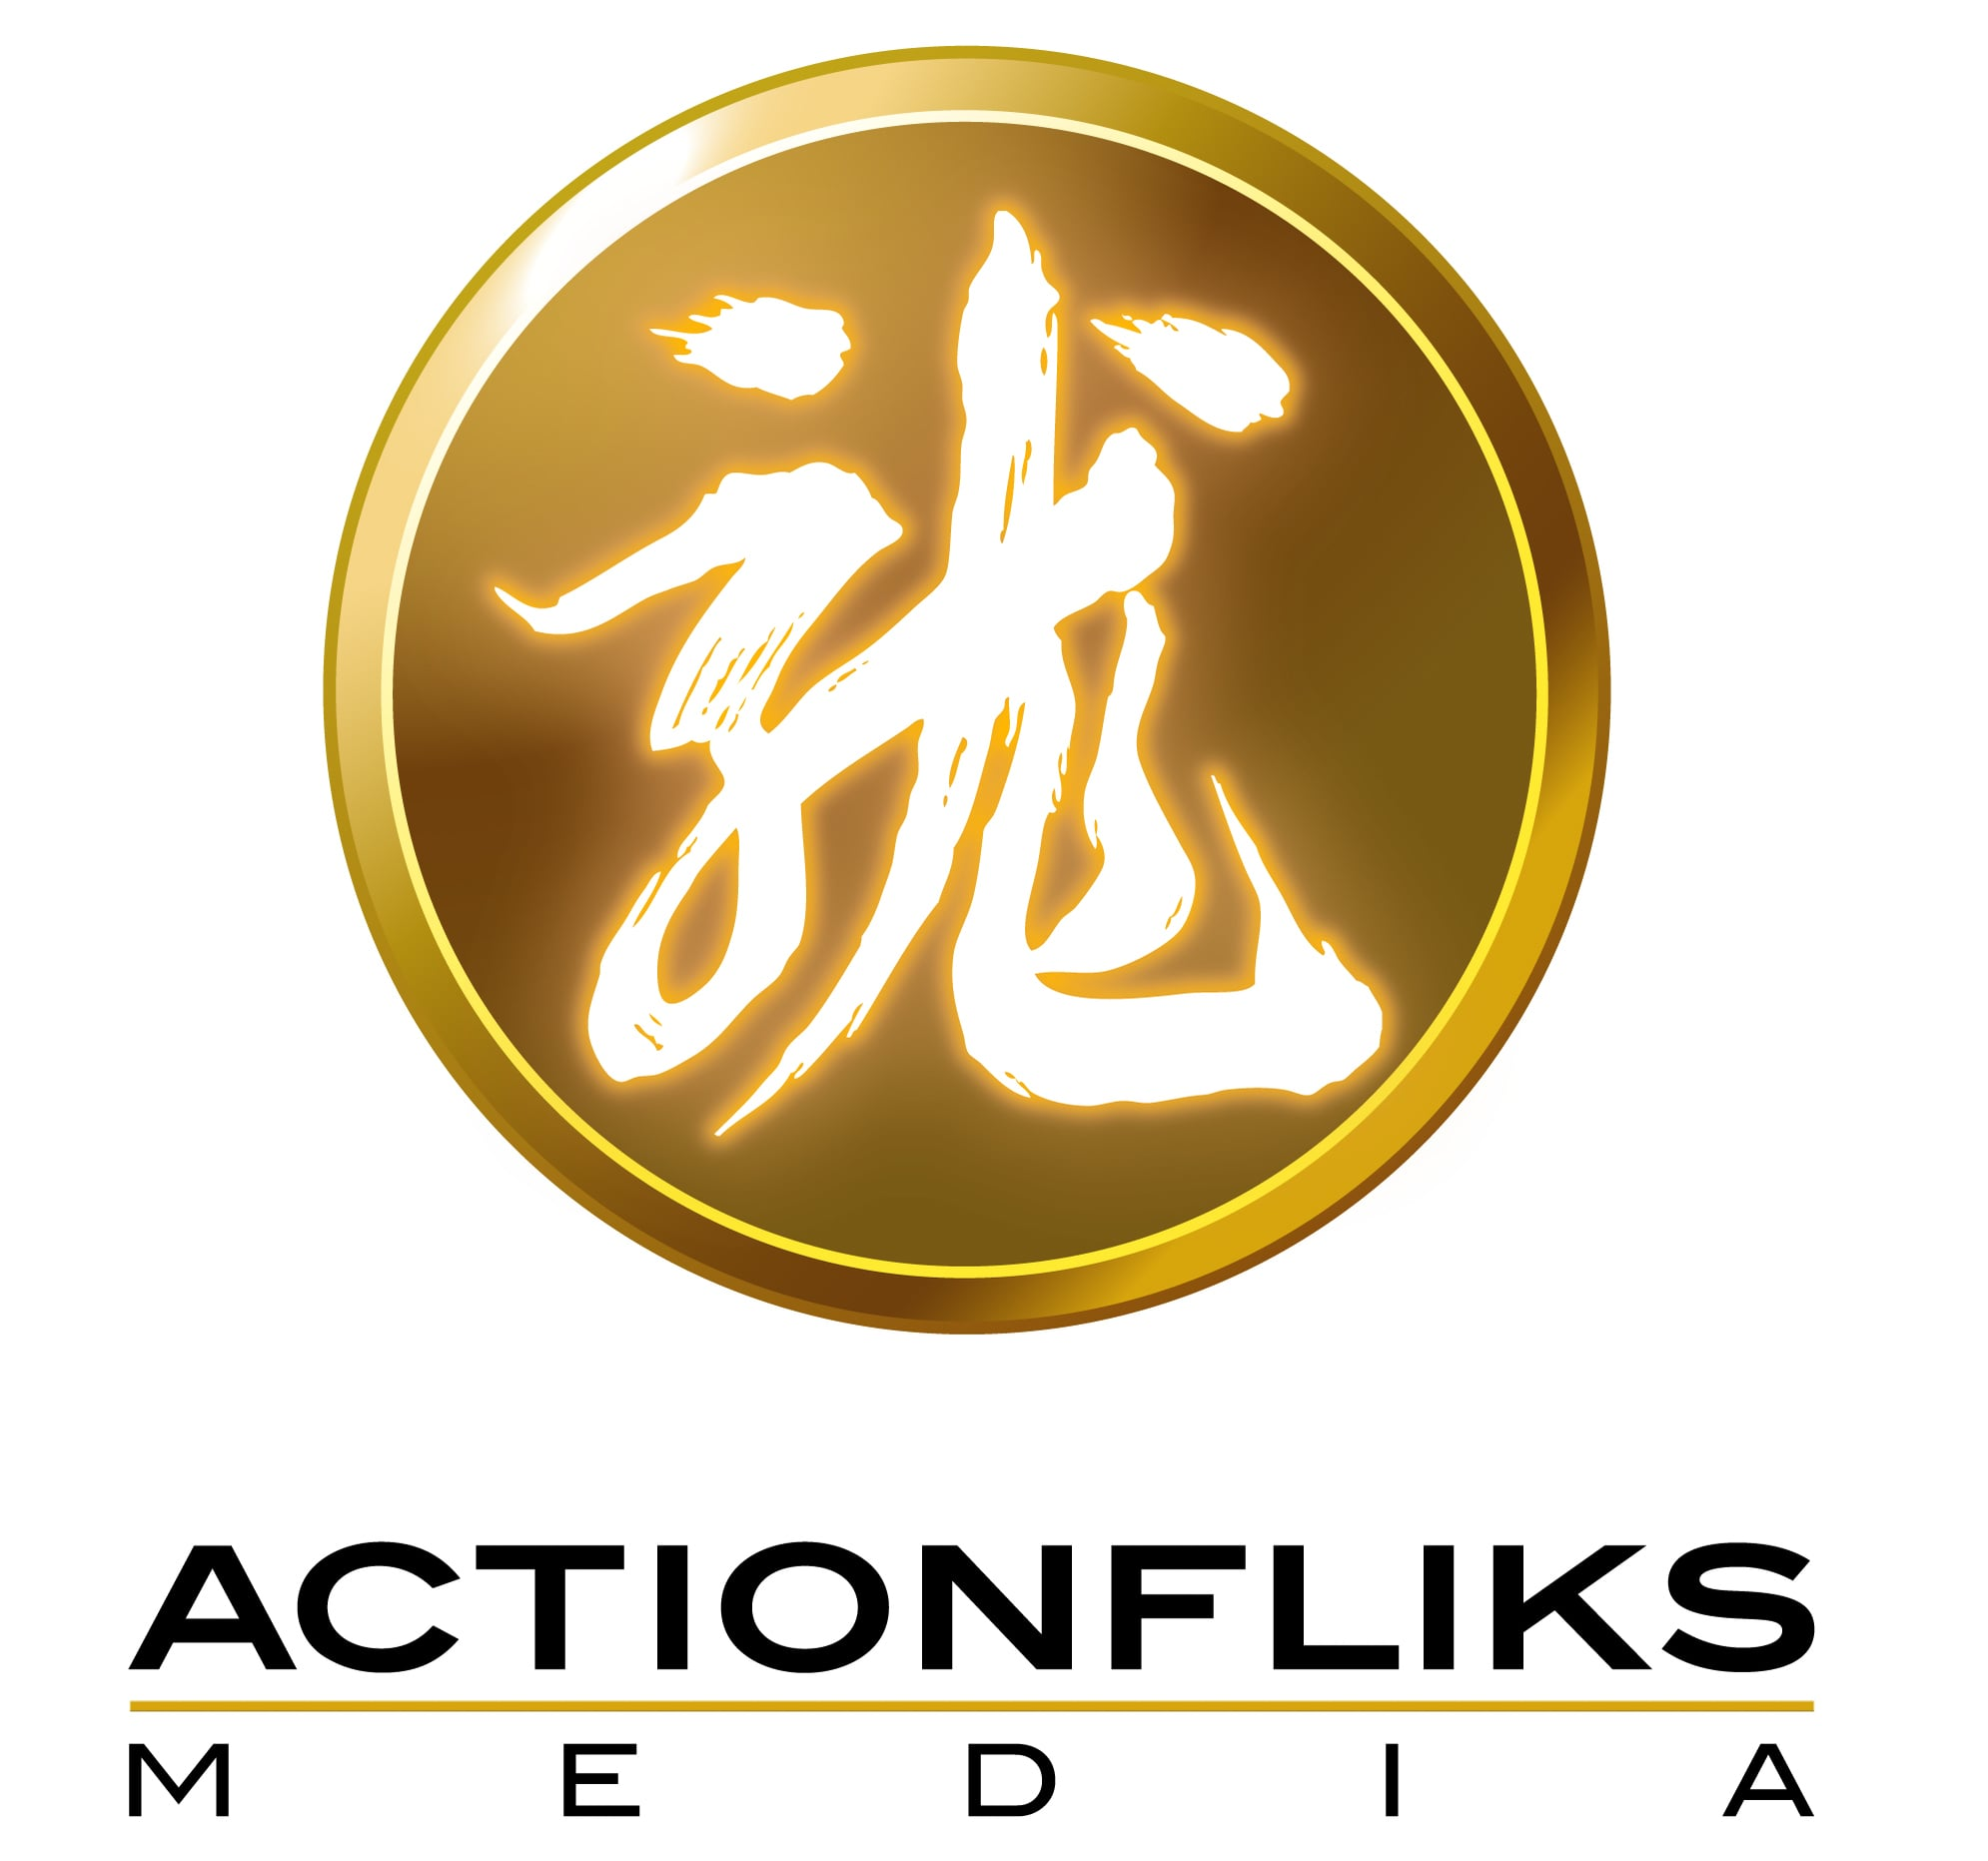 ActionFliks